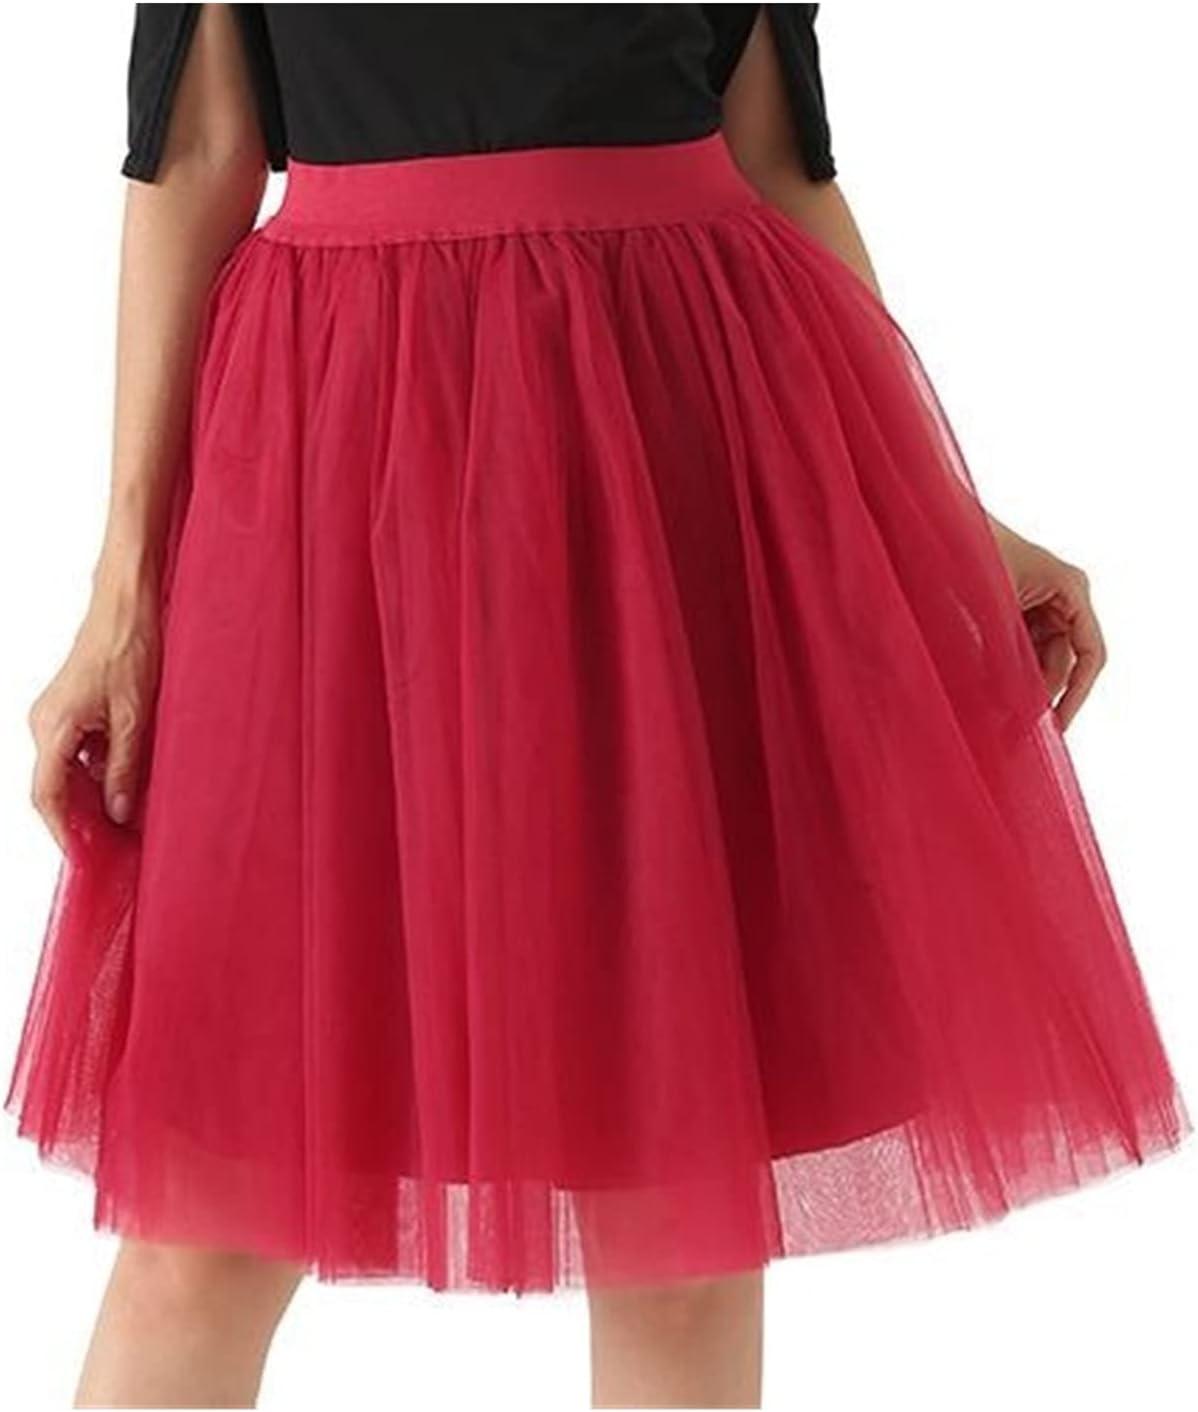 XLDQJPN Women's Tulle Skirt Tutu Wedding Bride Bridesmaid Skirt Skirt Petticoat Lolita Saiya (Color : Red Wine, Size : One Size)